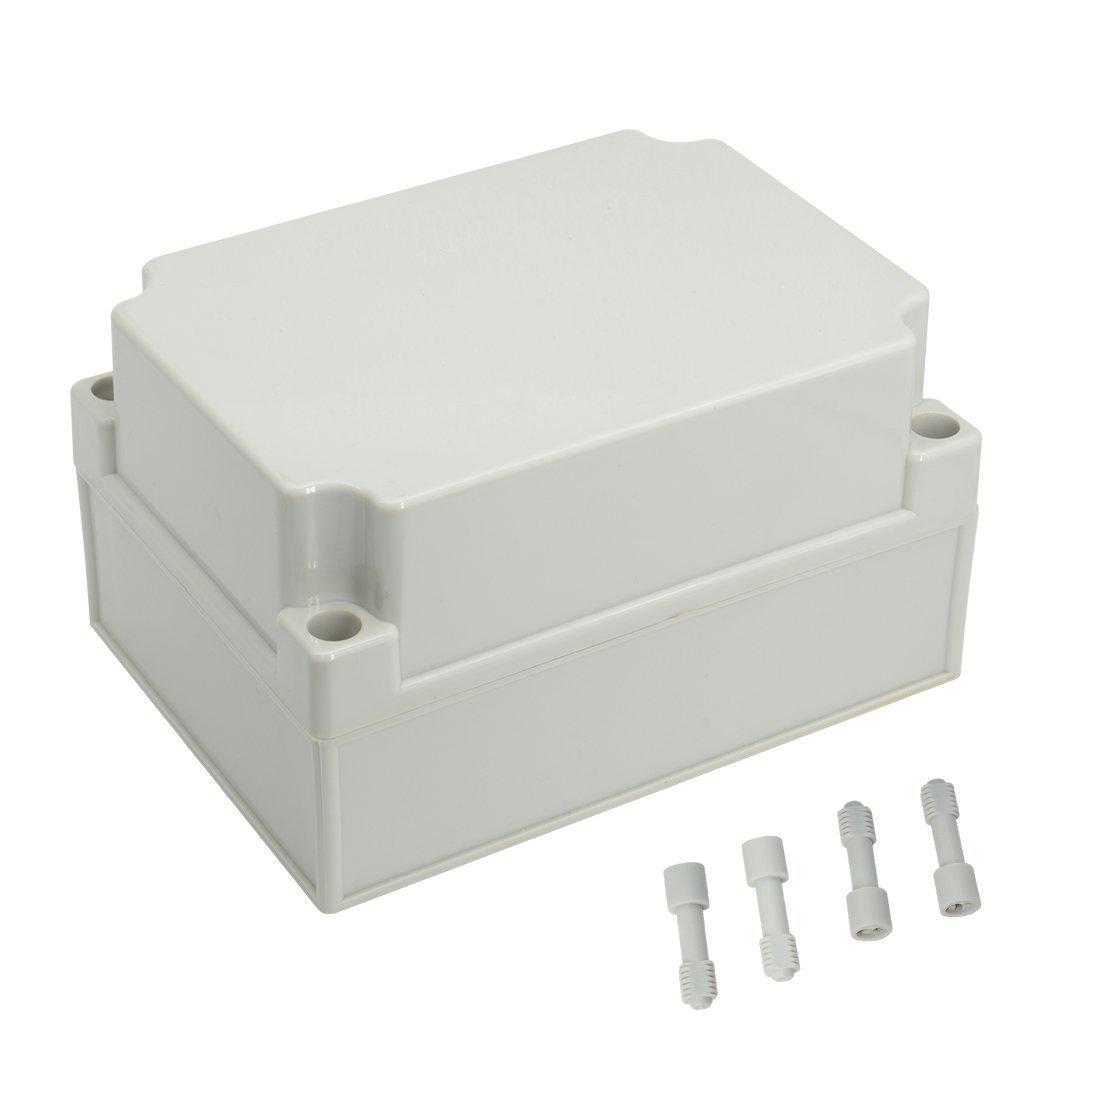 LeMotech Waterproof Dustproof IP67 Junction Box DIY Case Enclosure Gray 6.9'' x 4.9'' x 3.9''(175mm x 125mm x 100mm)